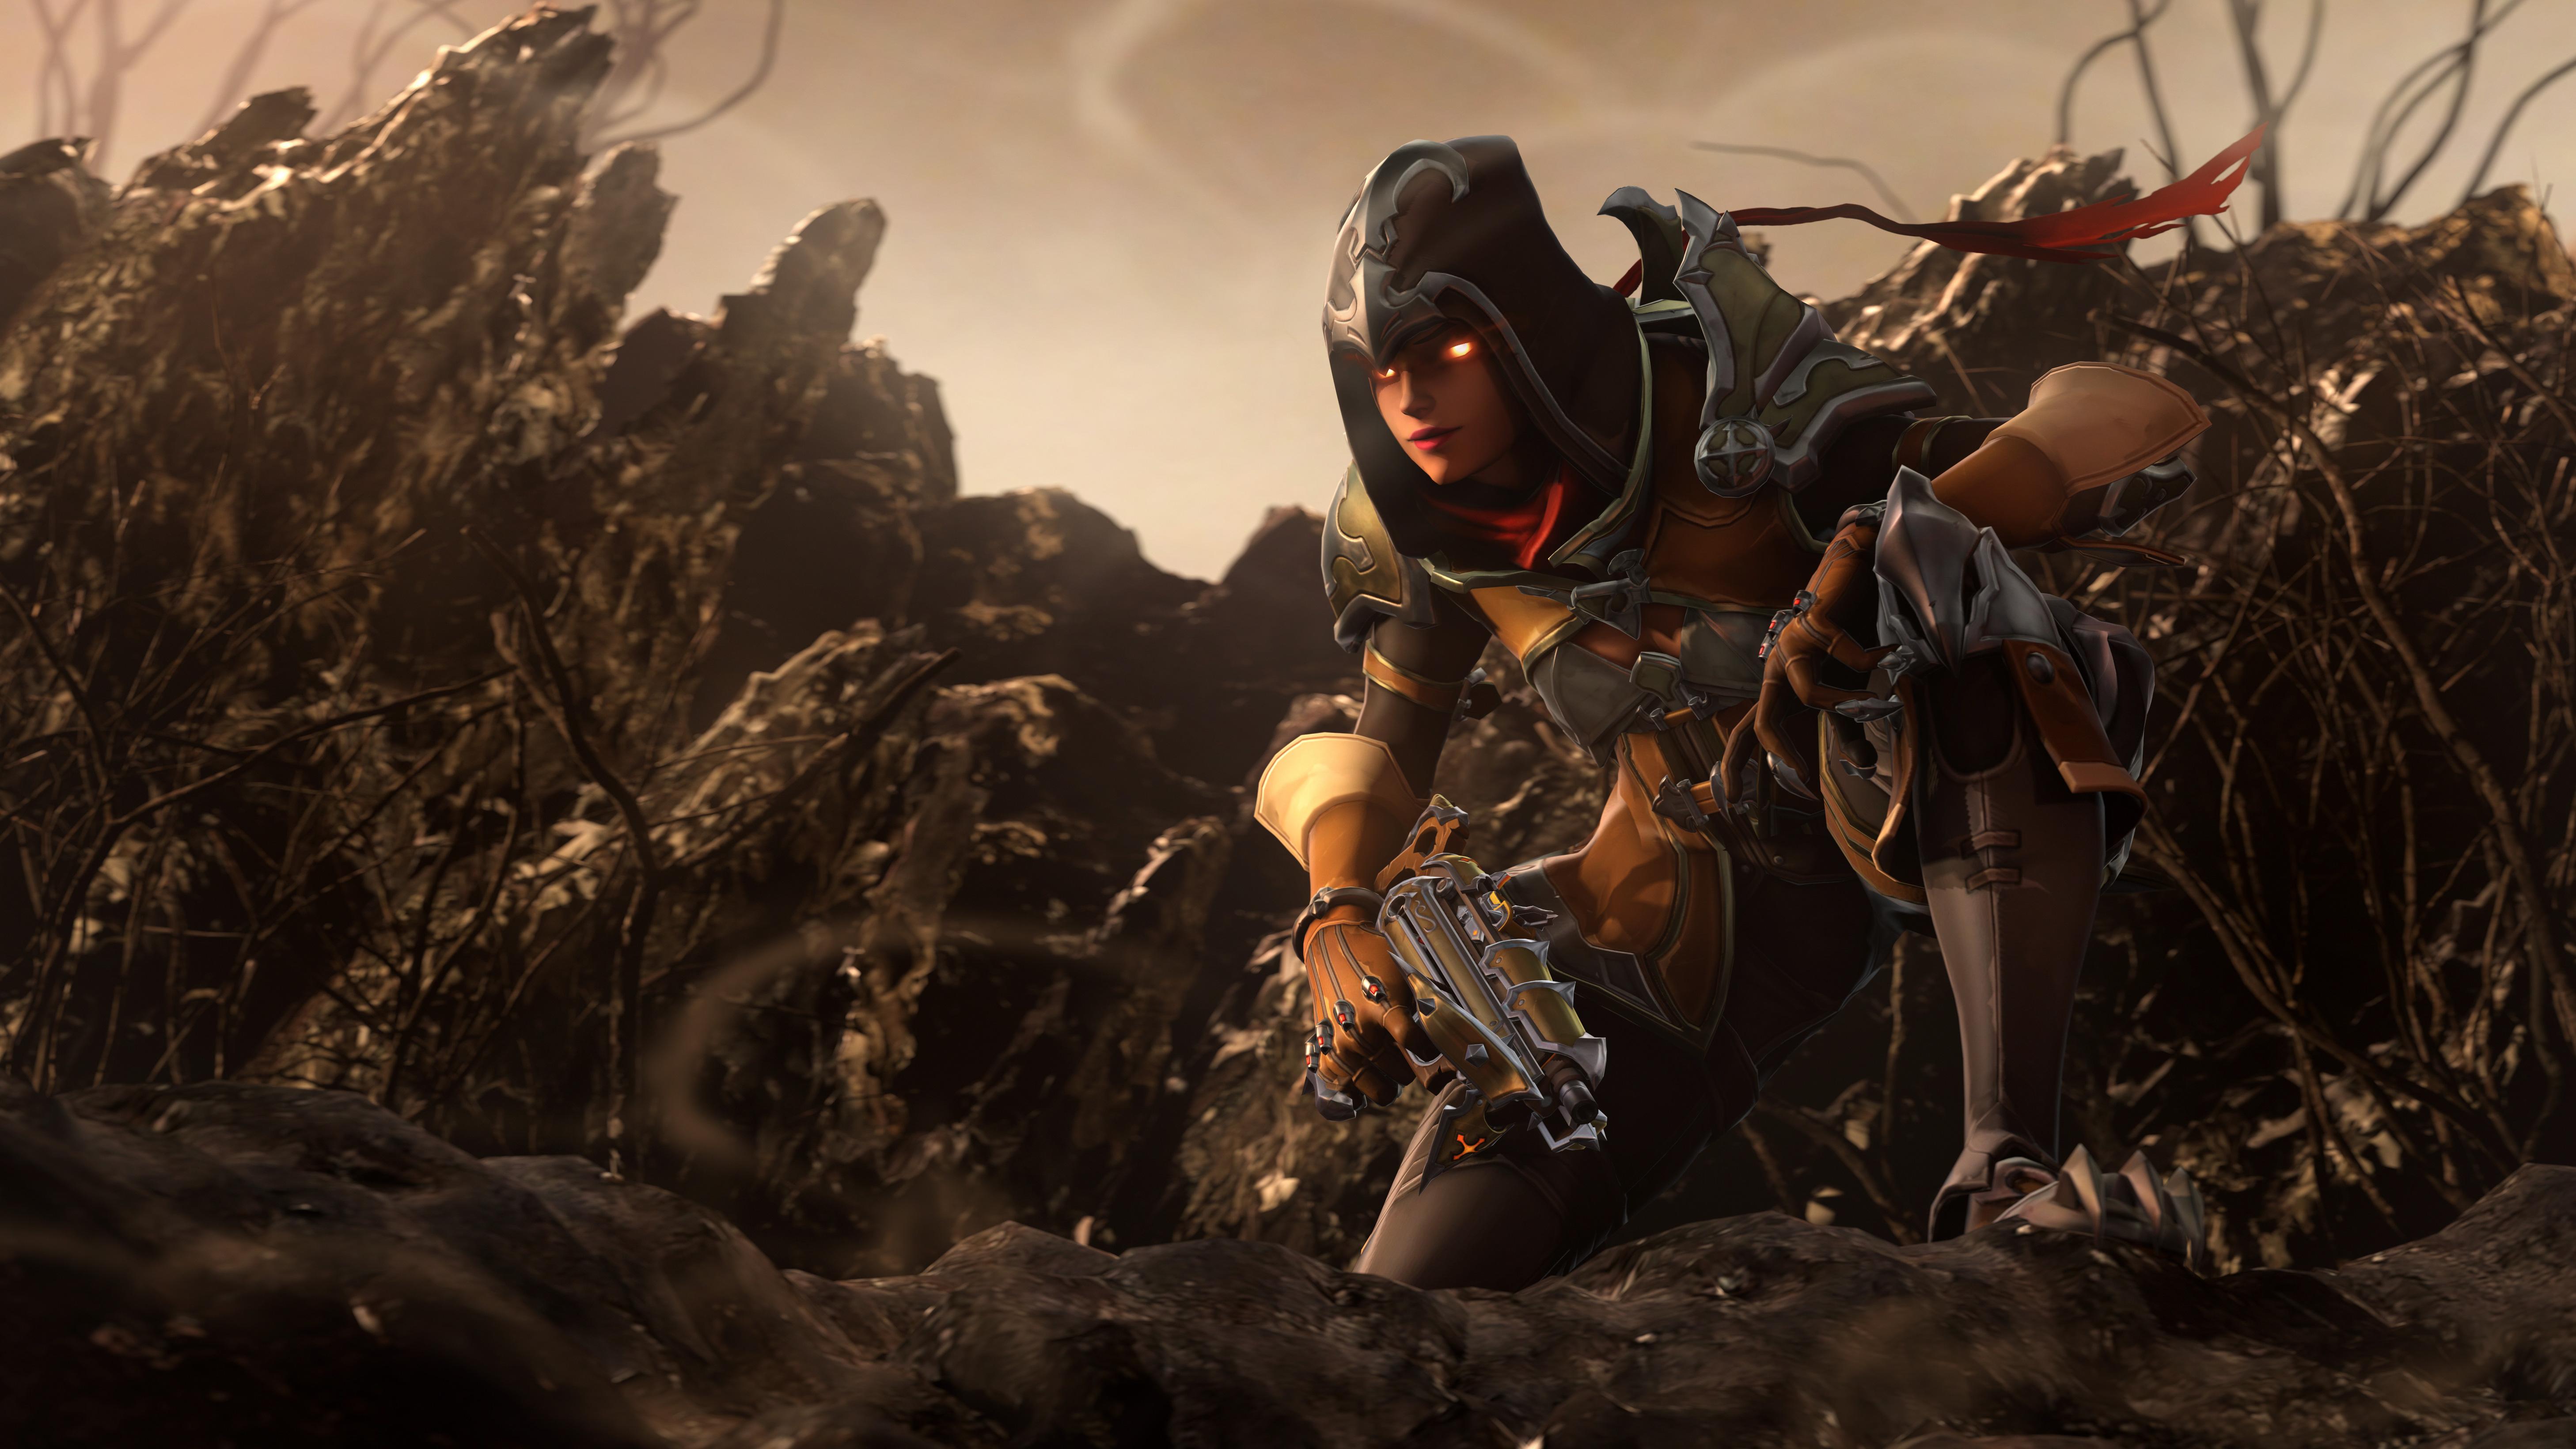 Sombra Overwatch 5k 2018, HD Games, 4k Wallpapers, Images ...